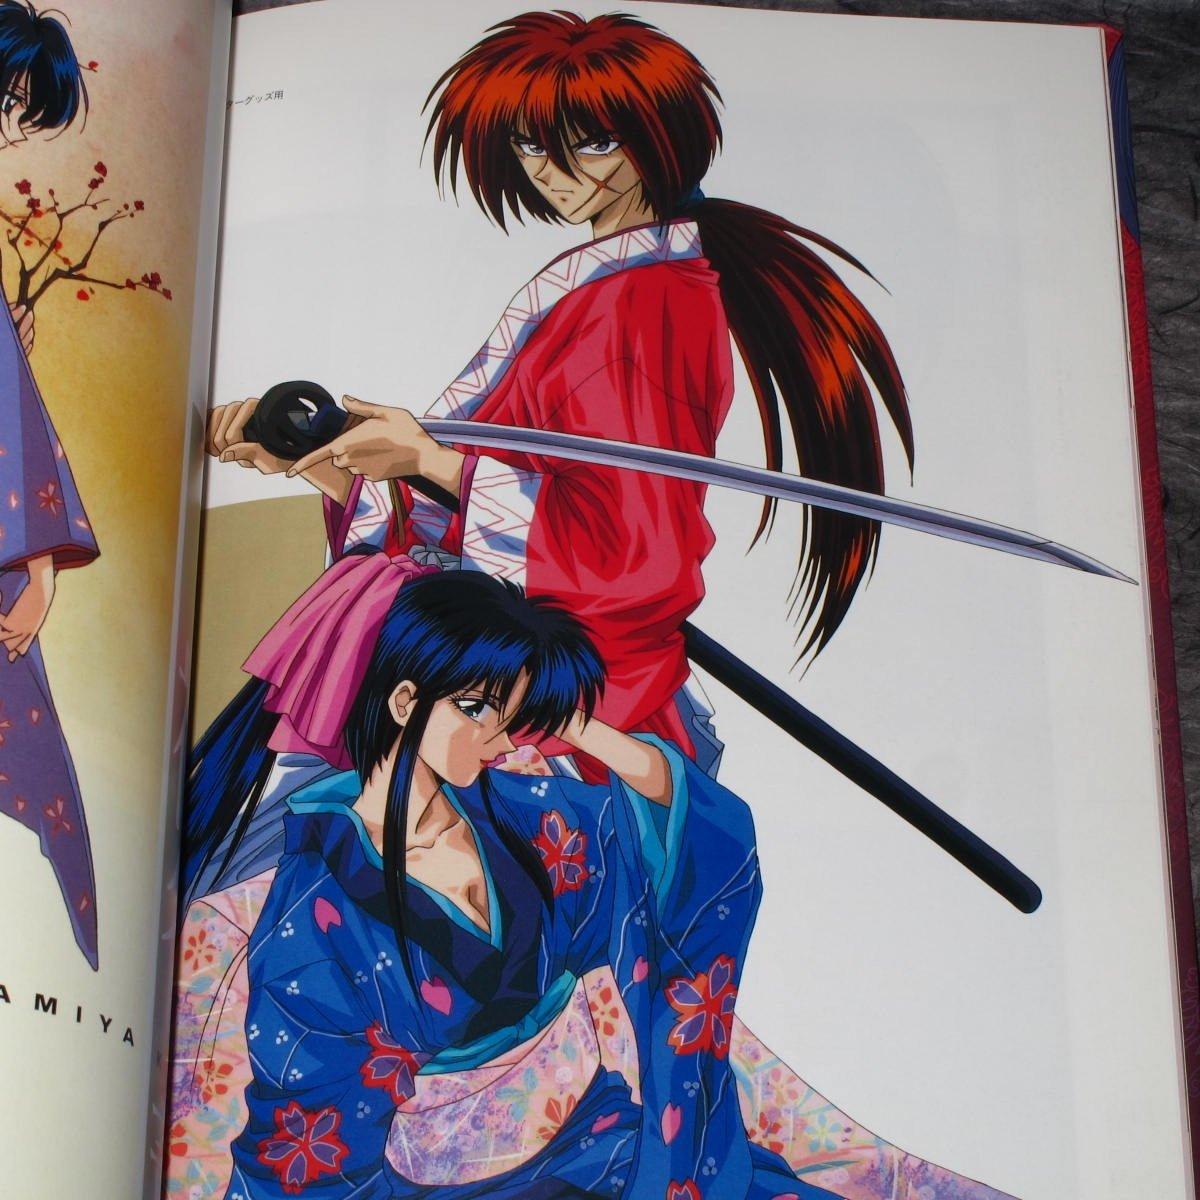 Rurouni kenshin cell works collection anime art book rurouni kenshin 9789573484141 amazon com books